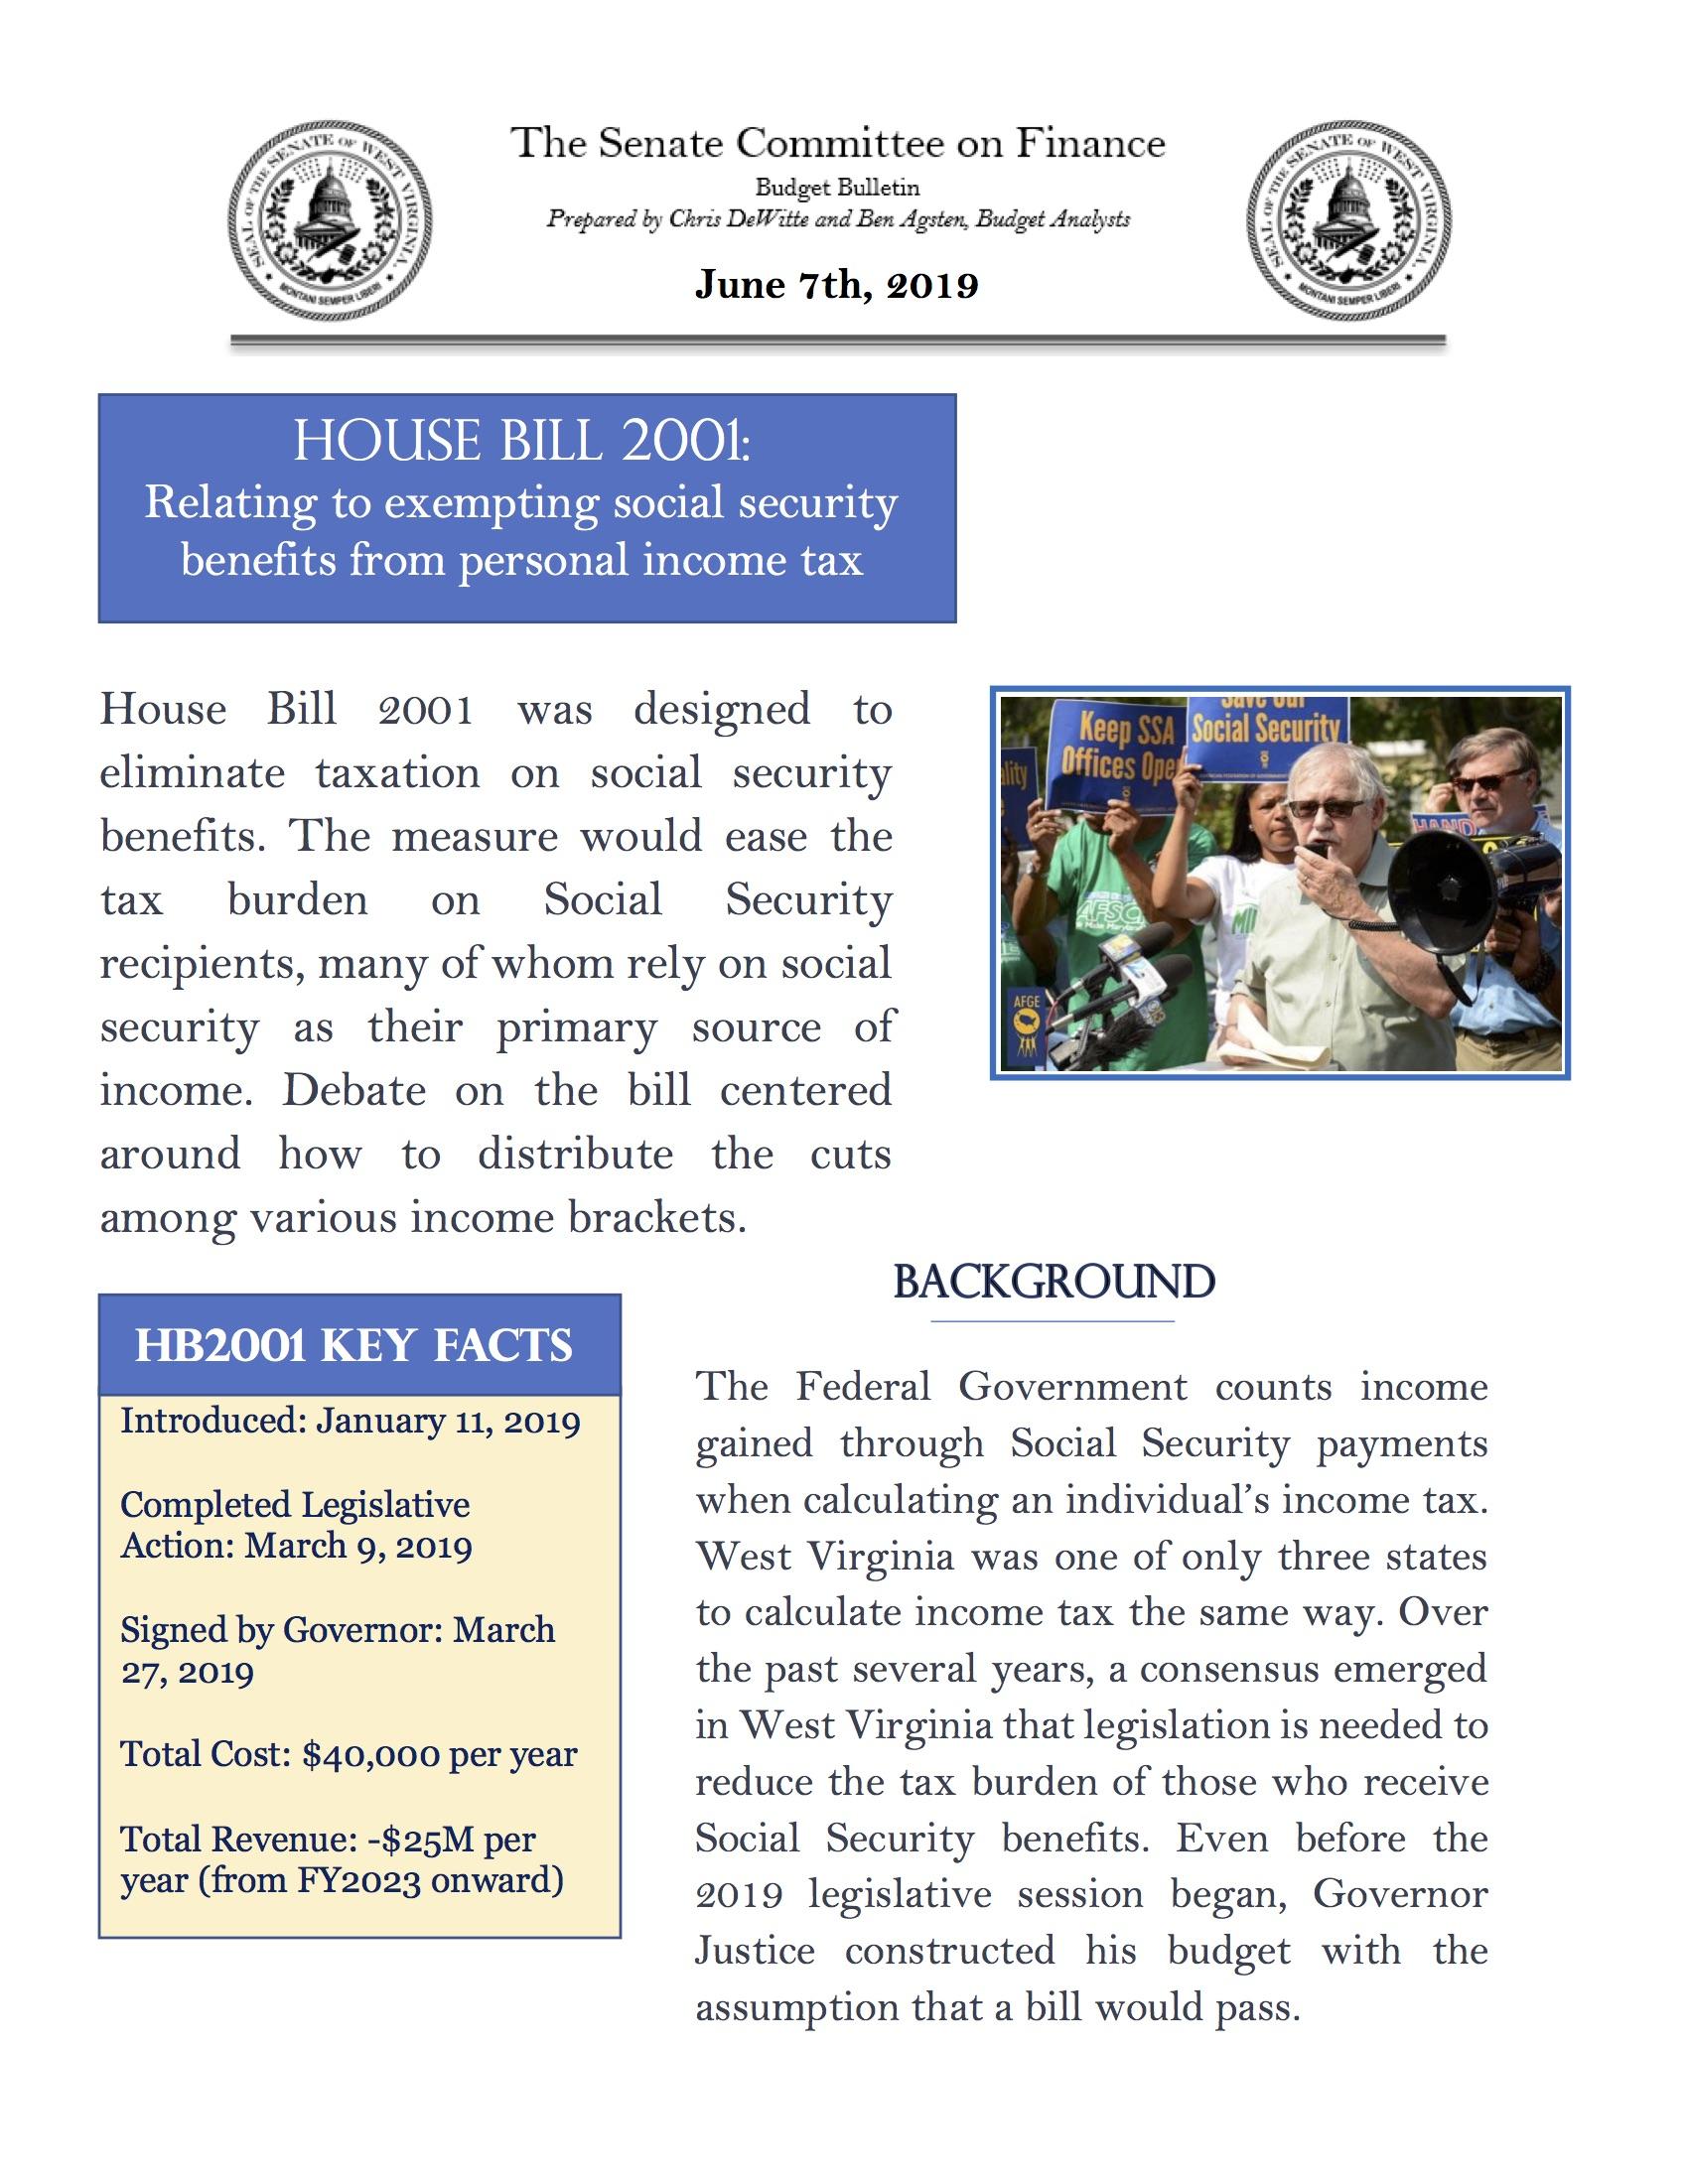 W Va  Senate's Finance Committee Budget Bulletin: Exempting